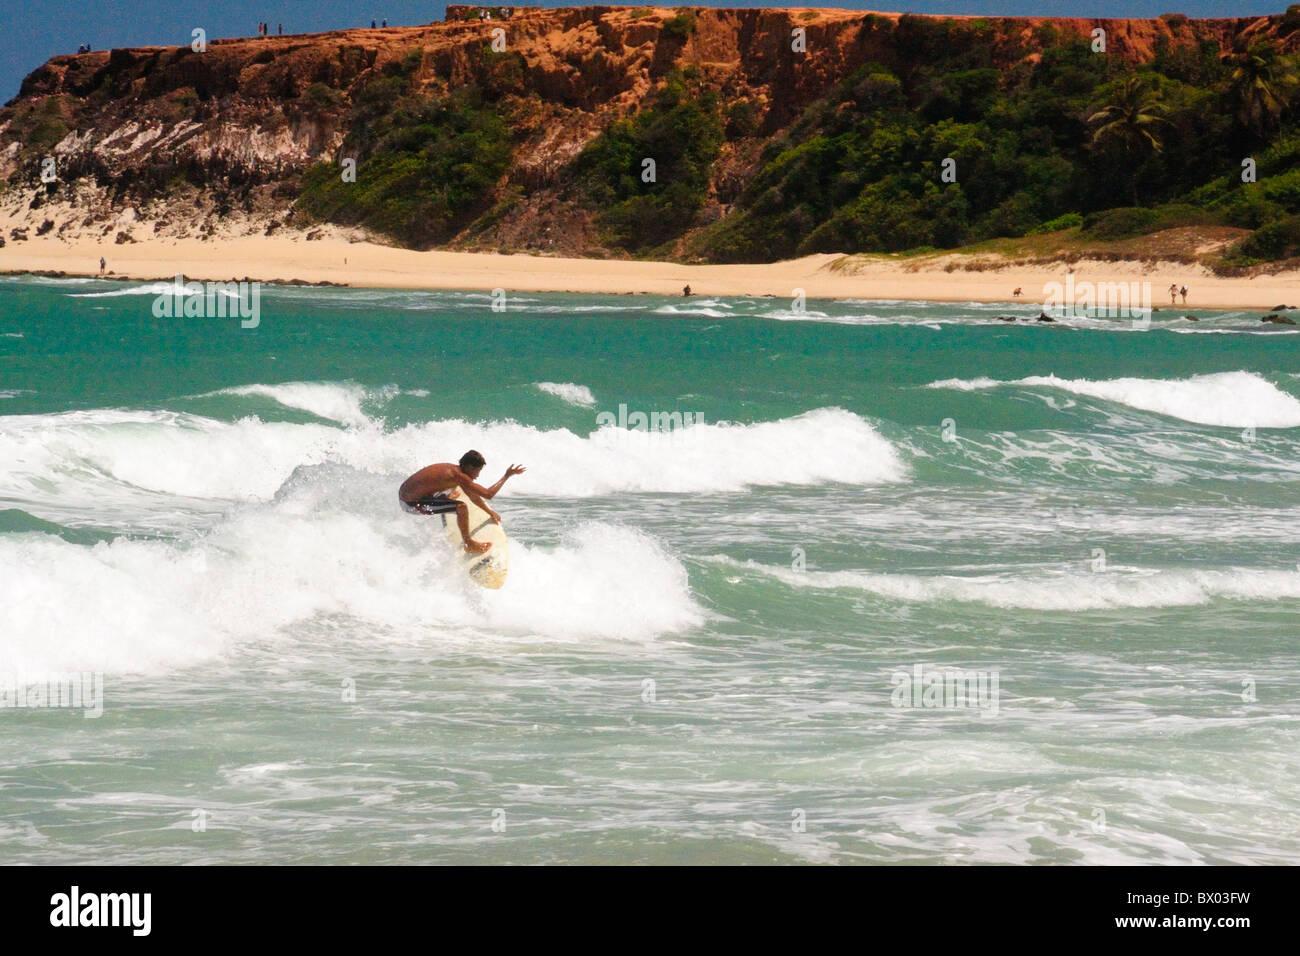 Navegante de Praia do Amor, Playa de Pipa, Brasil. Imagen De Stock